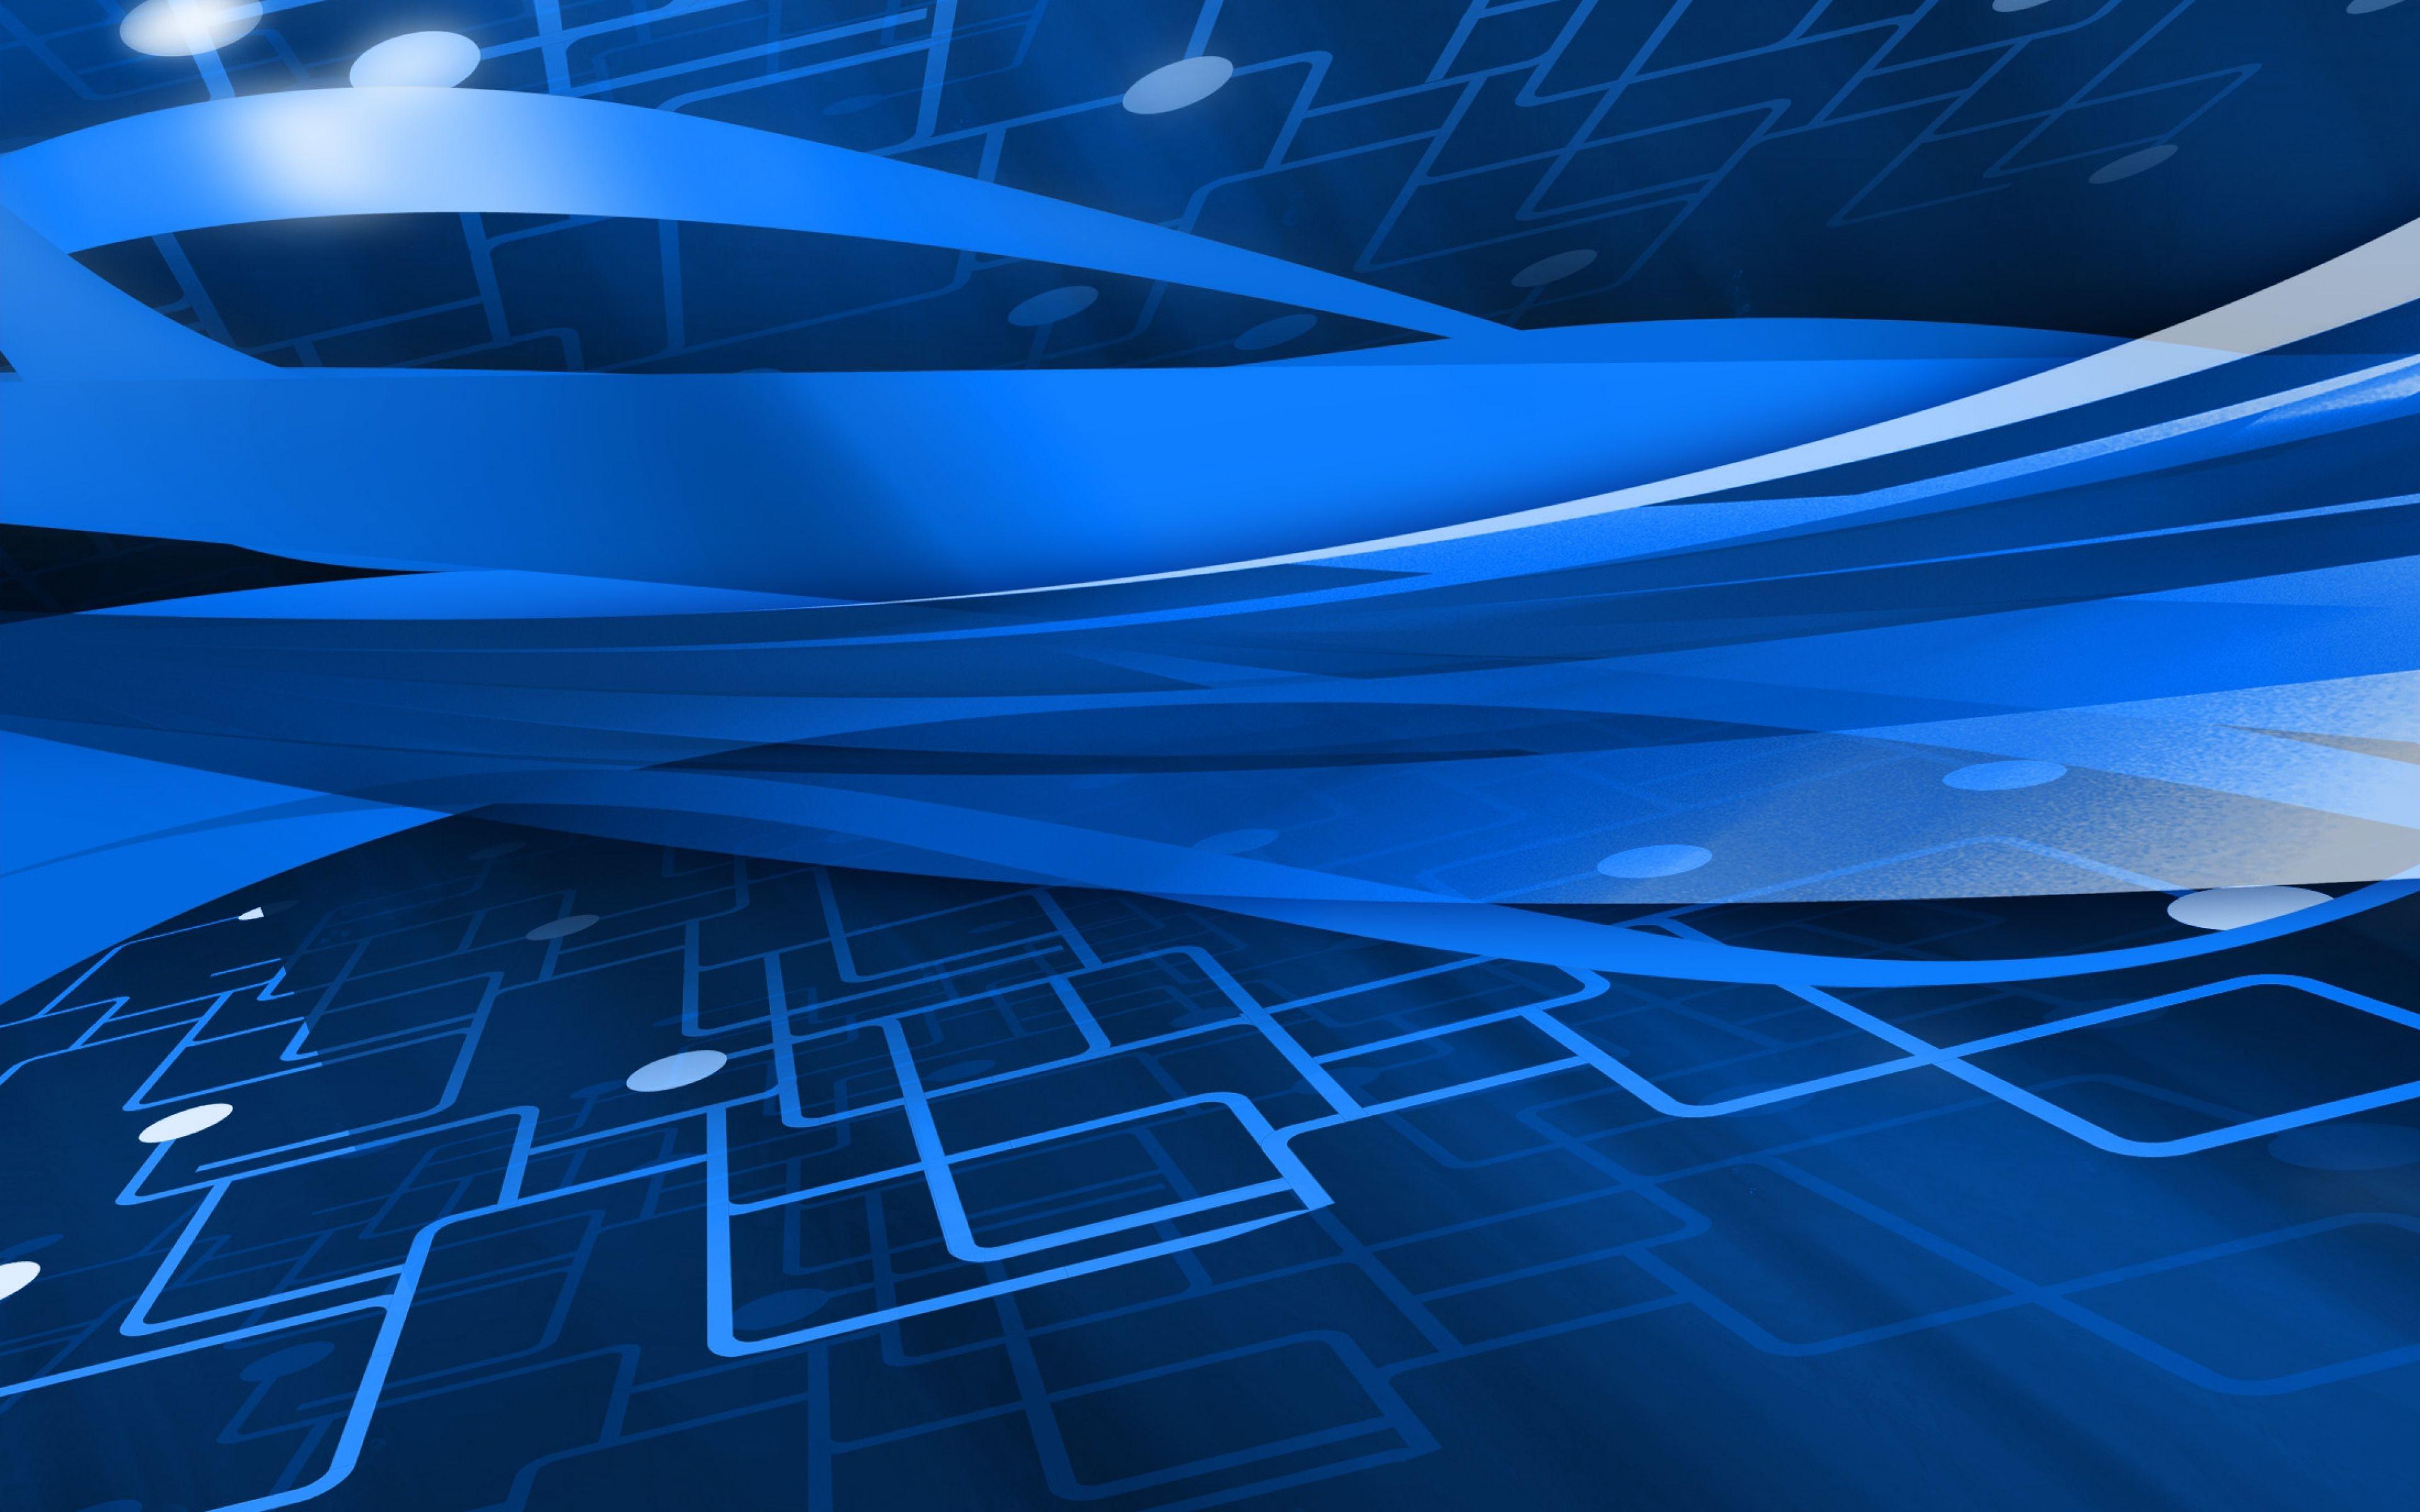 3840x2400 Wallpaper Abstract Schematic White Blue Line Unas Azules 4k Hd